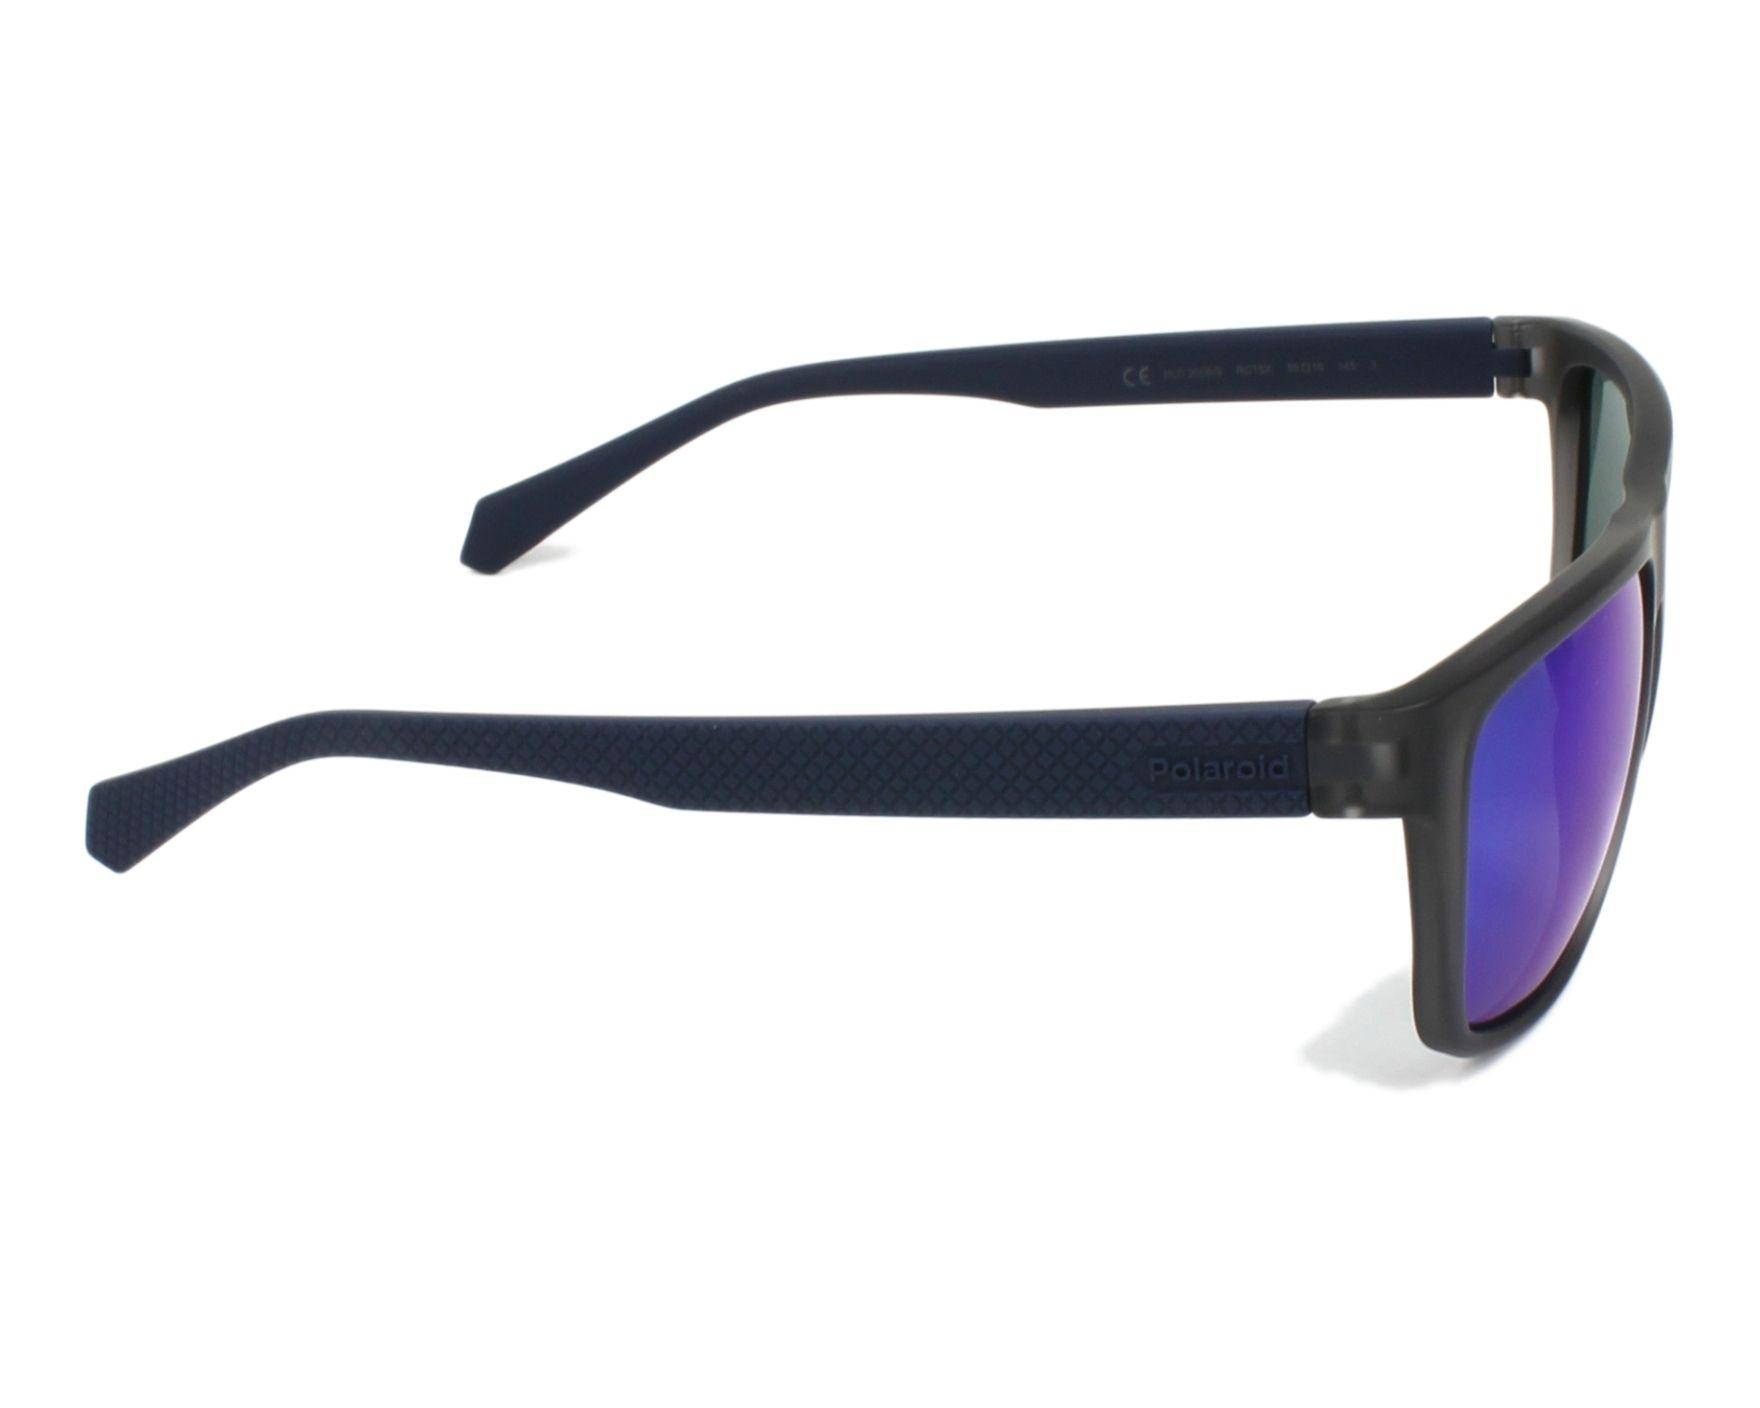 a82c20d0a5a9 Sunglasses Polaroid PLD-2058-S RCT/5X 55-16 Grey Blue side